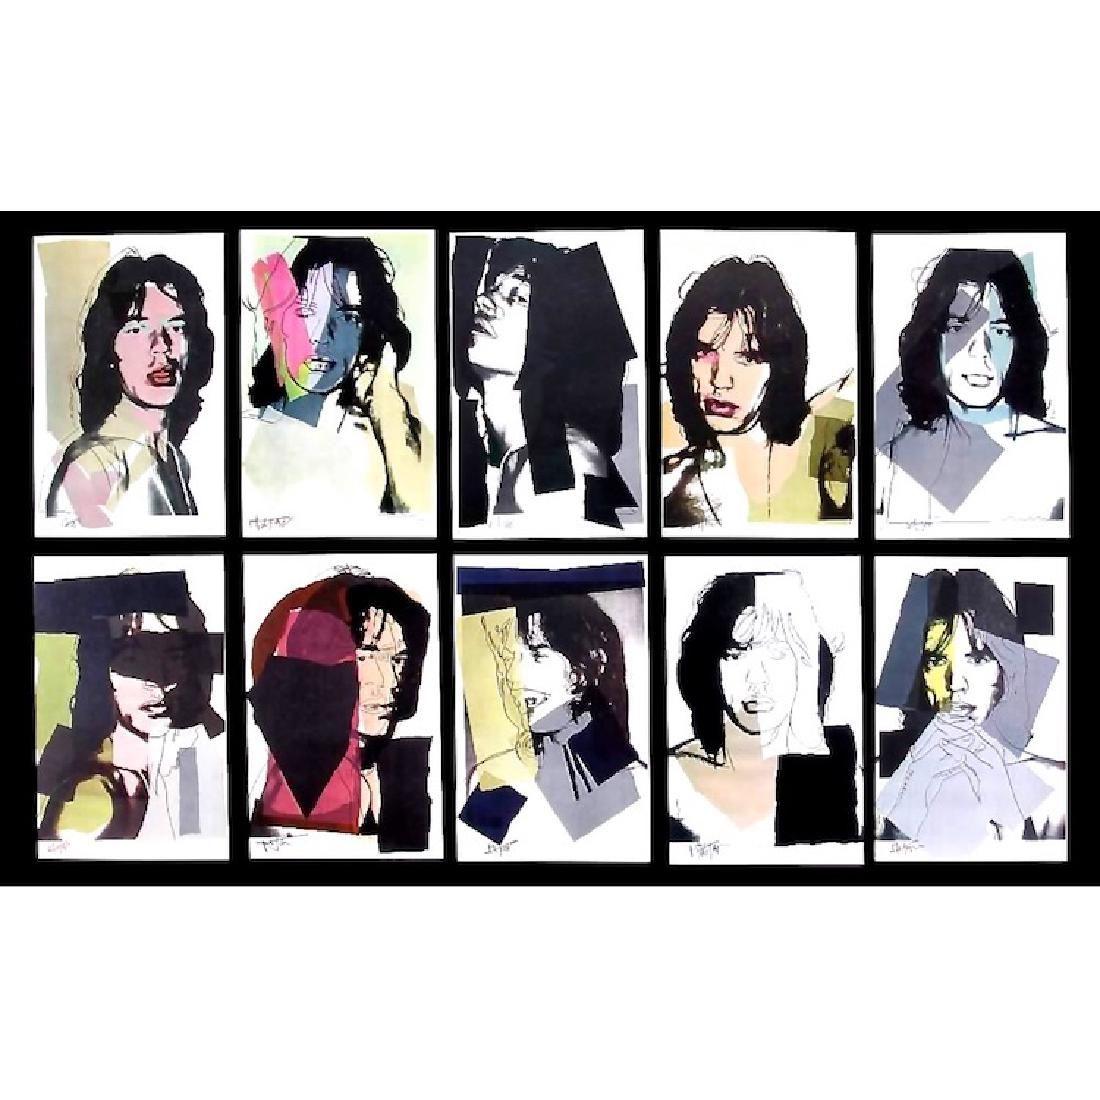 Andy Warhol - Mick Jagger - Postcard Suite